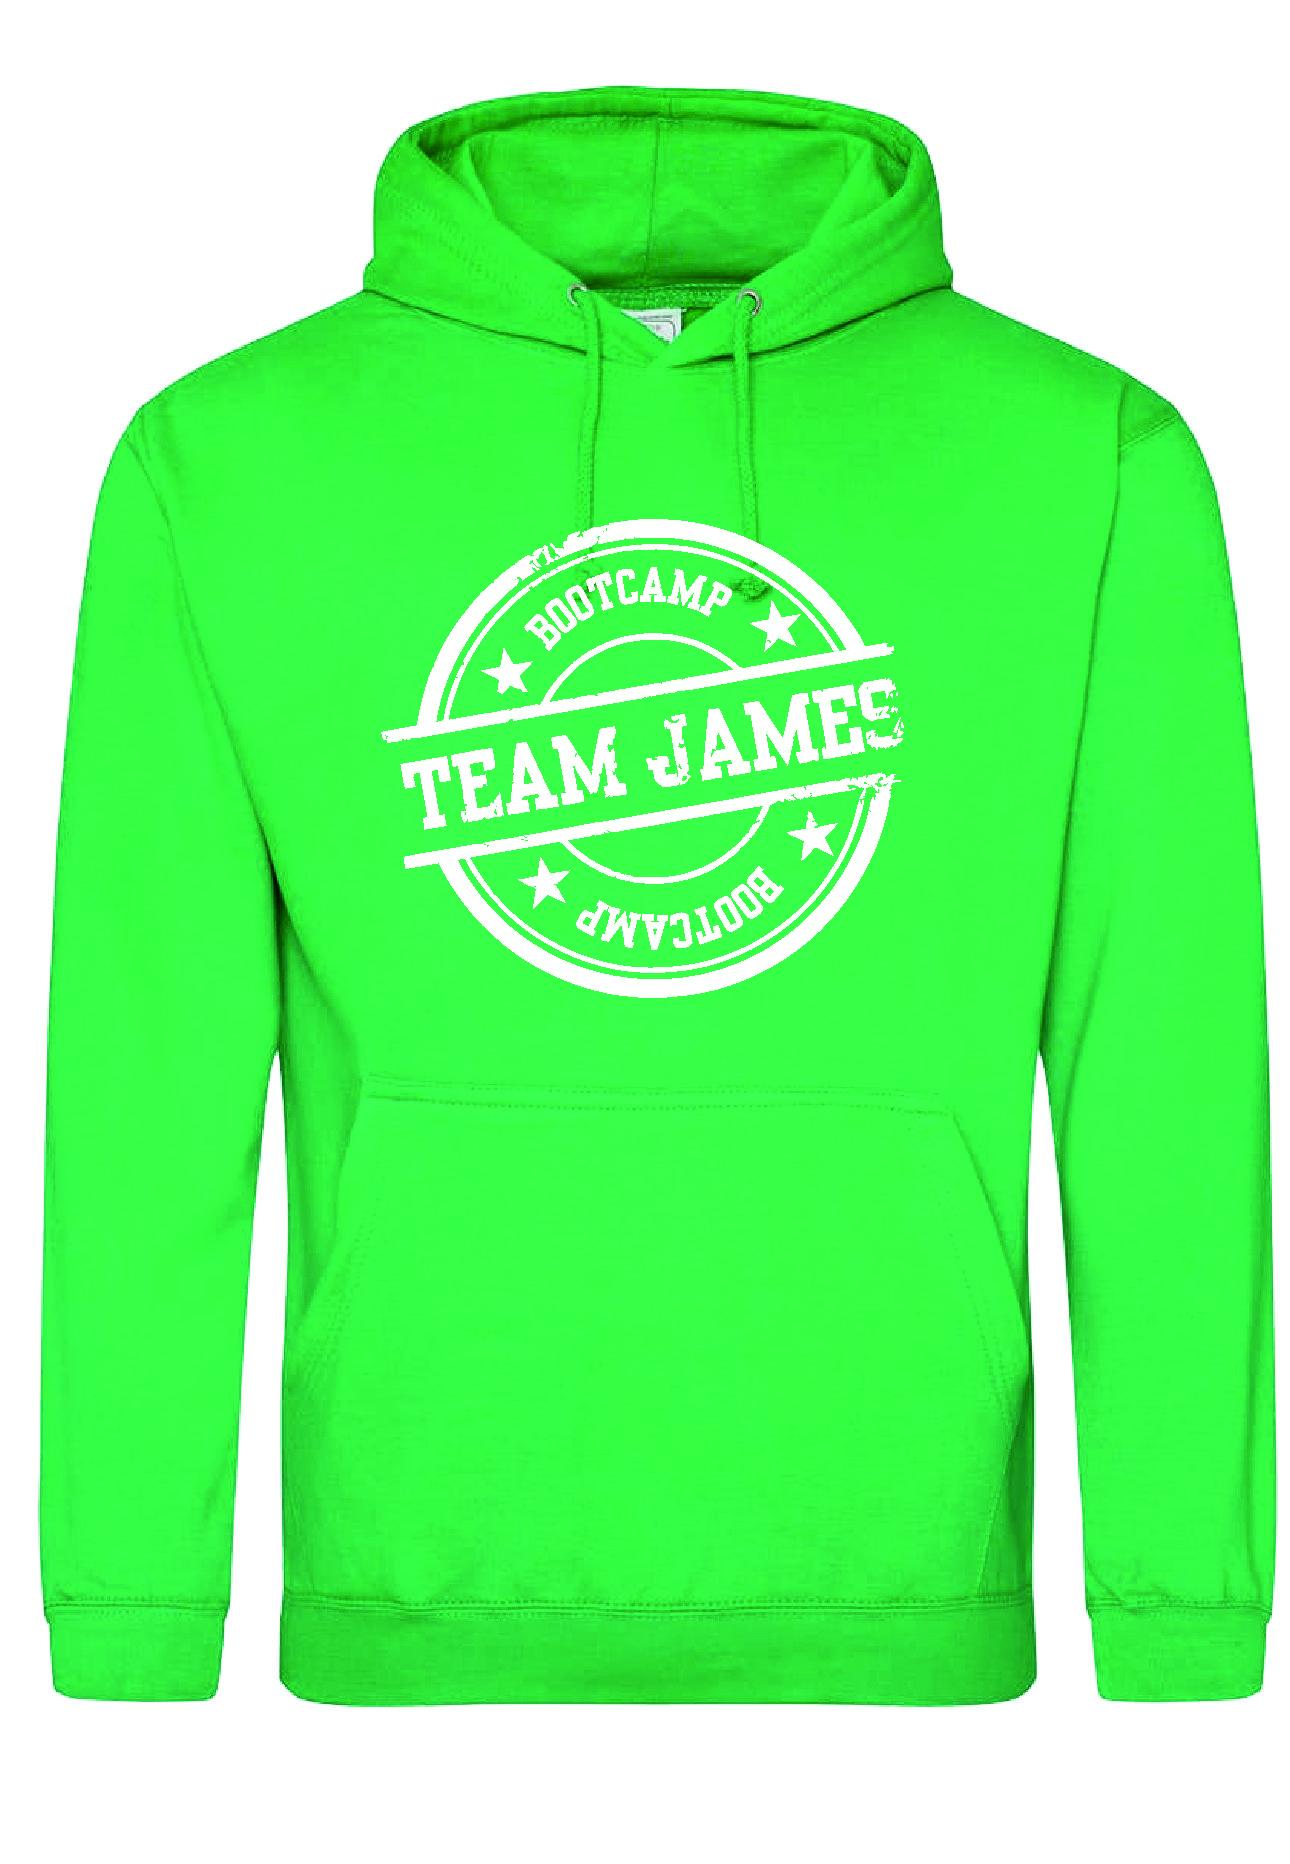 Team James - Hoodie (Unisex)